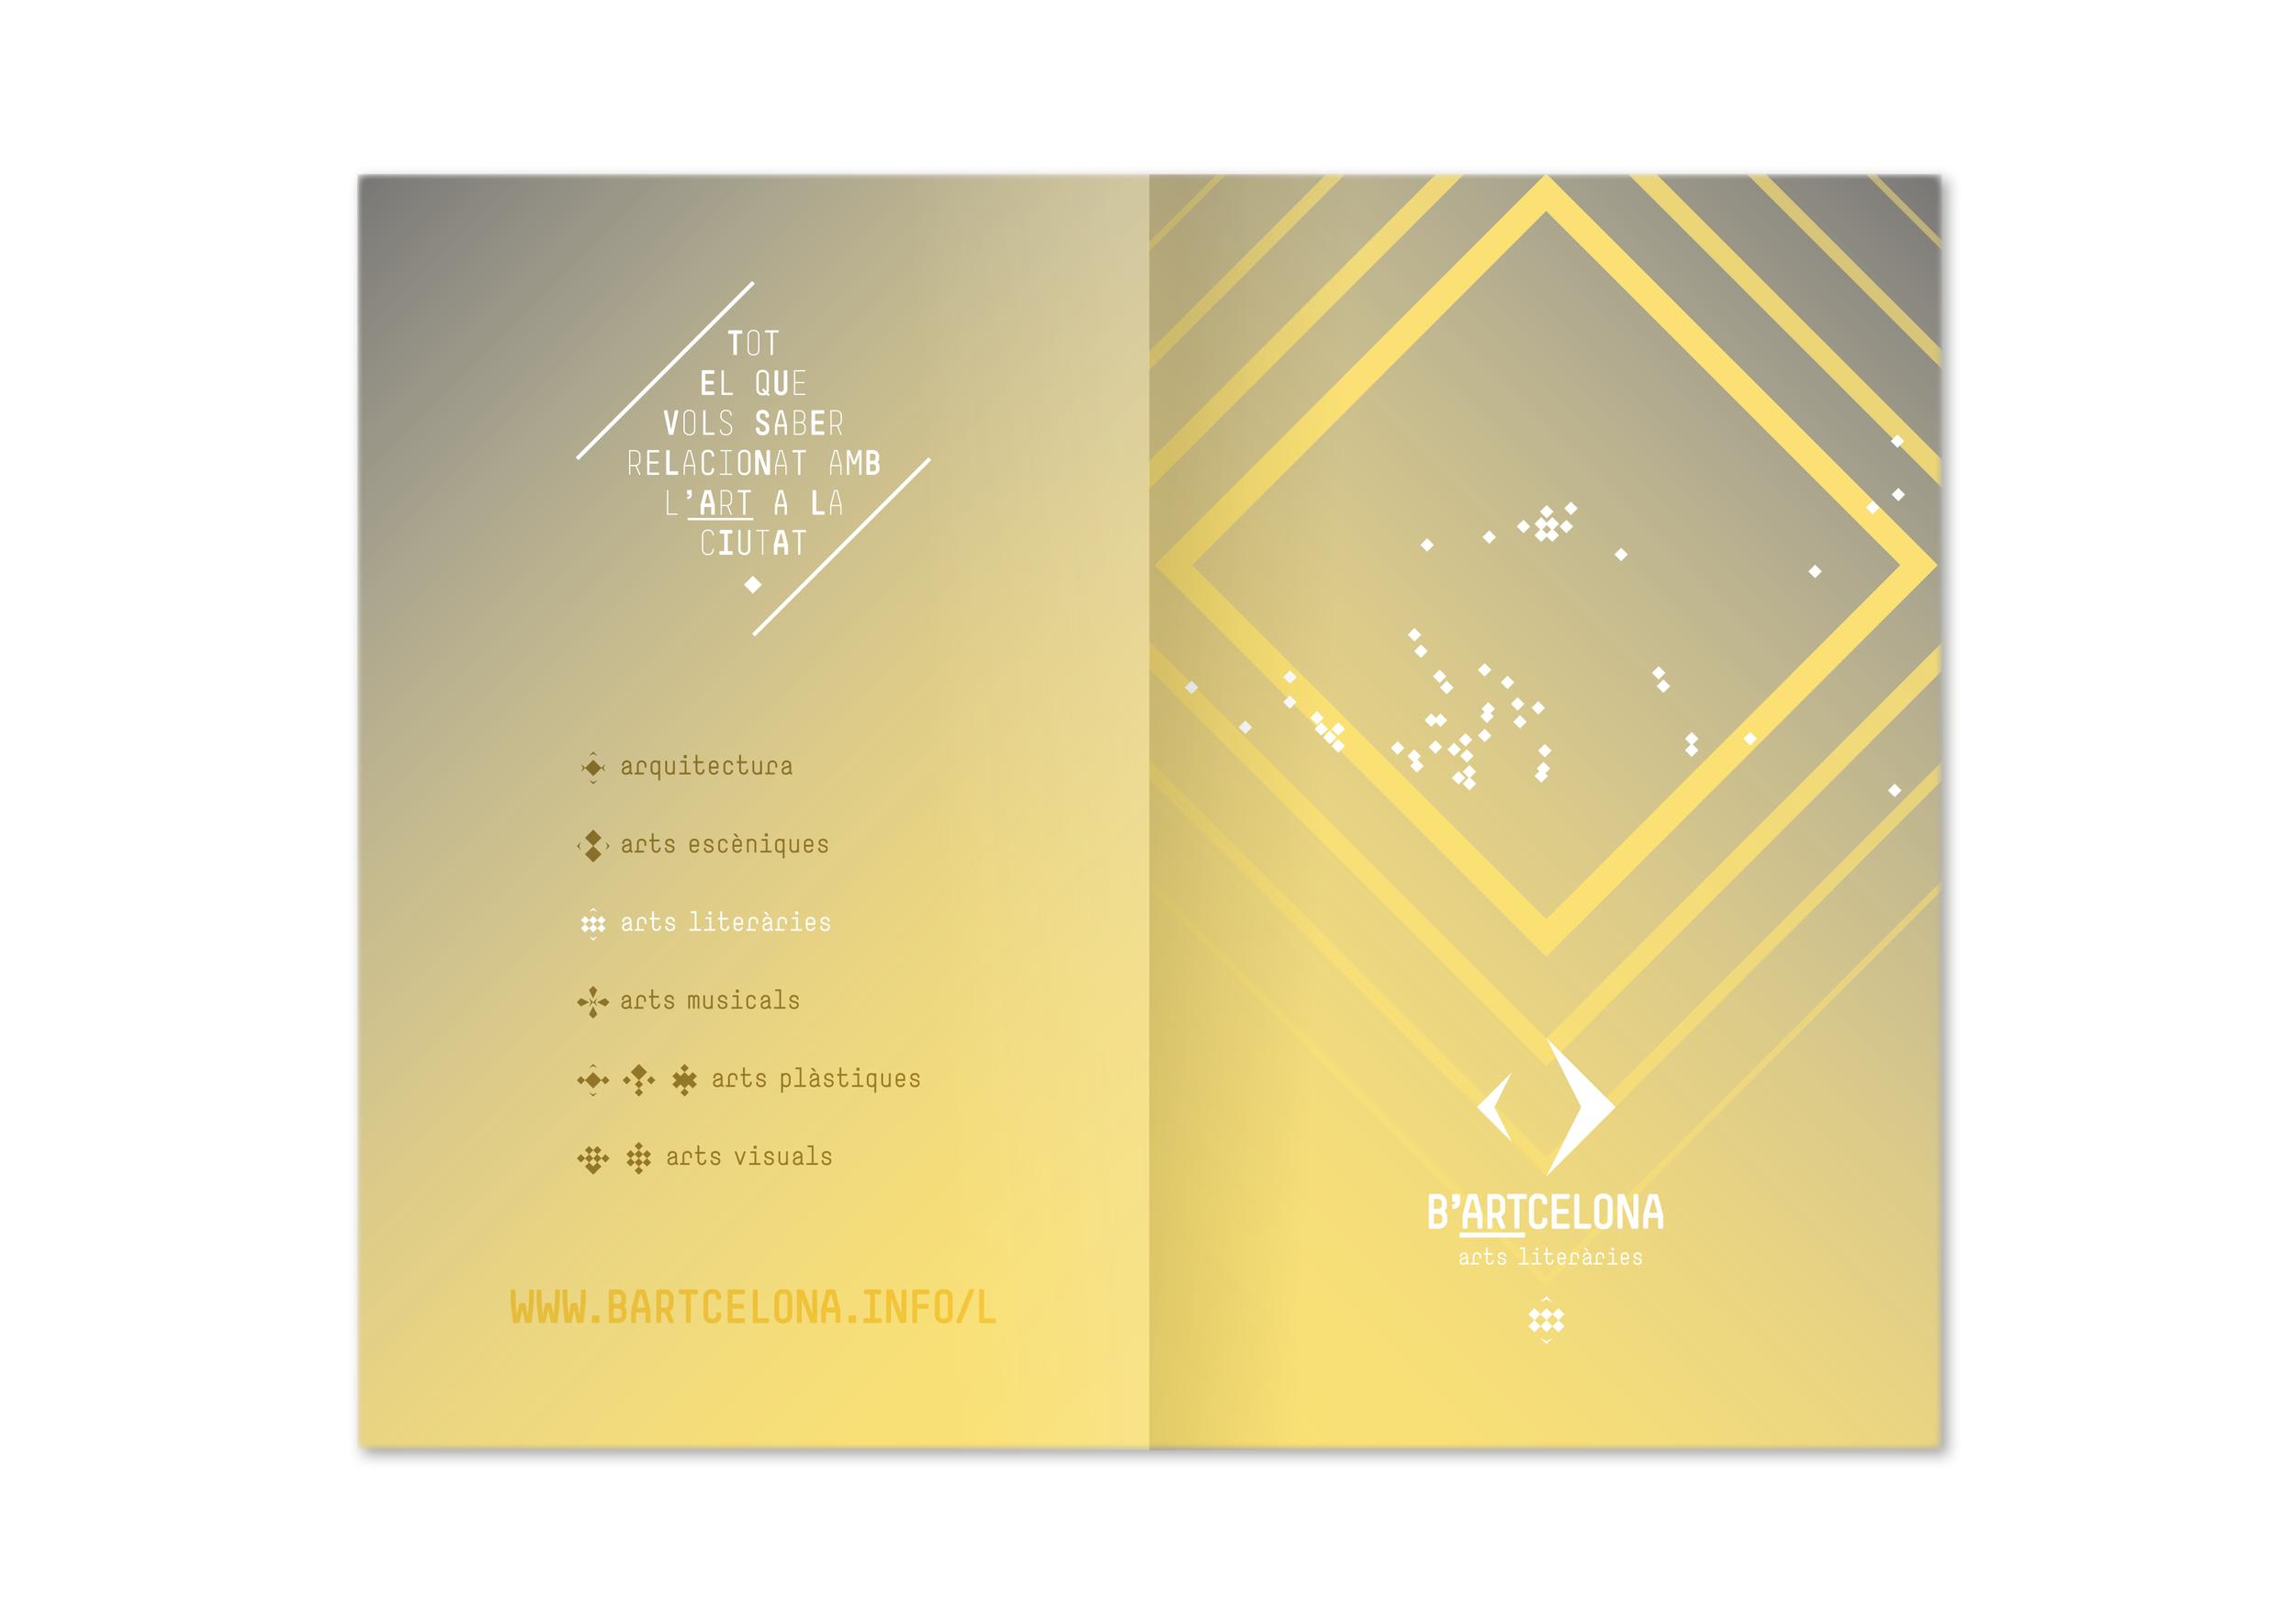 bartcelona_cover_bk3_victorgc.png